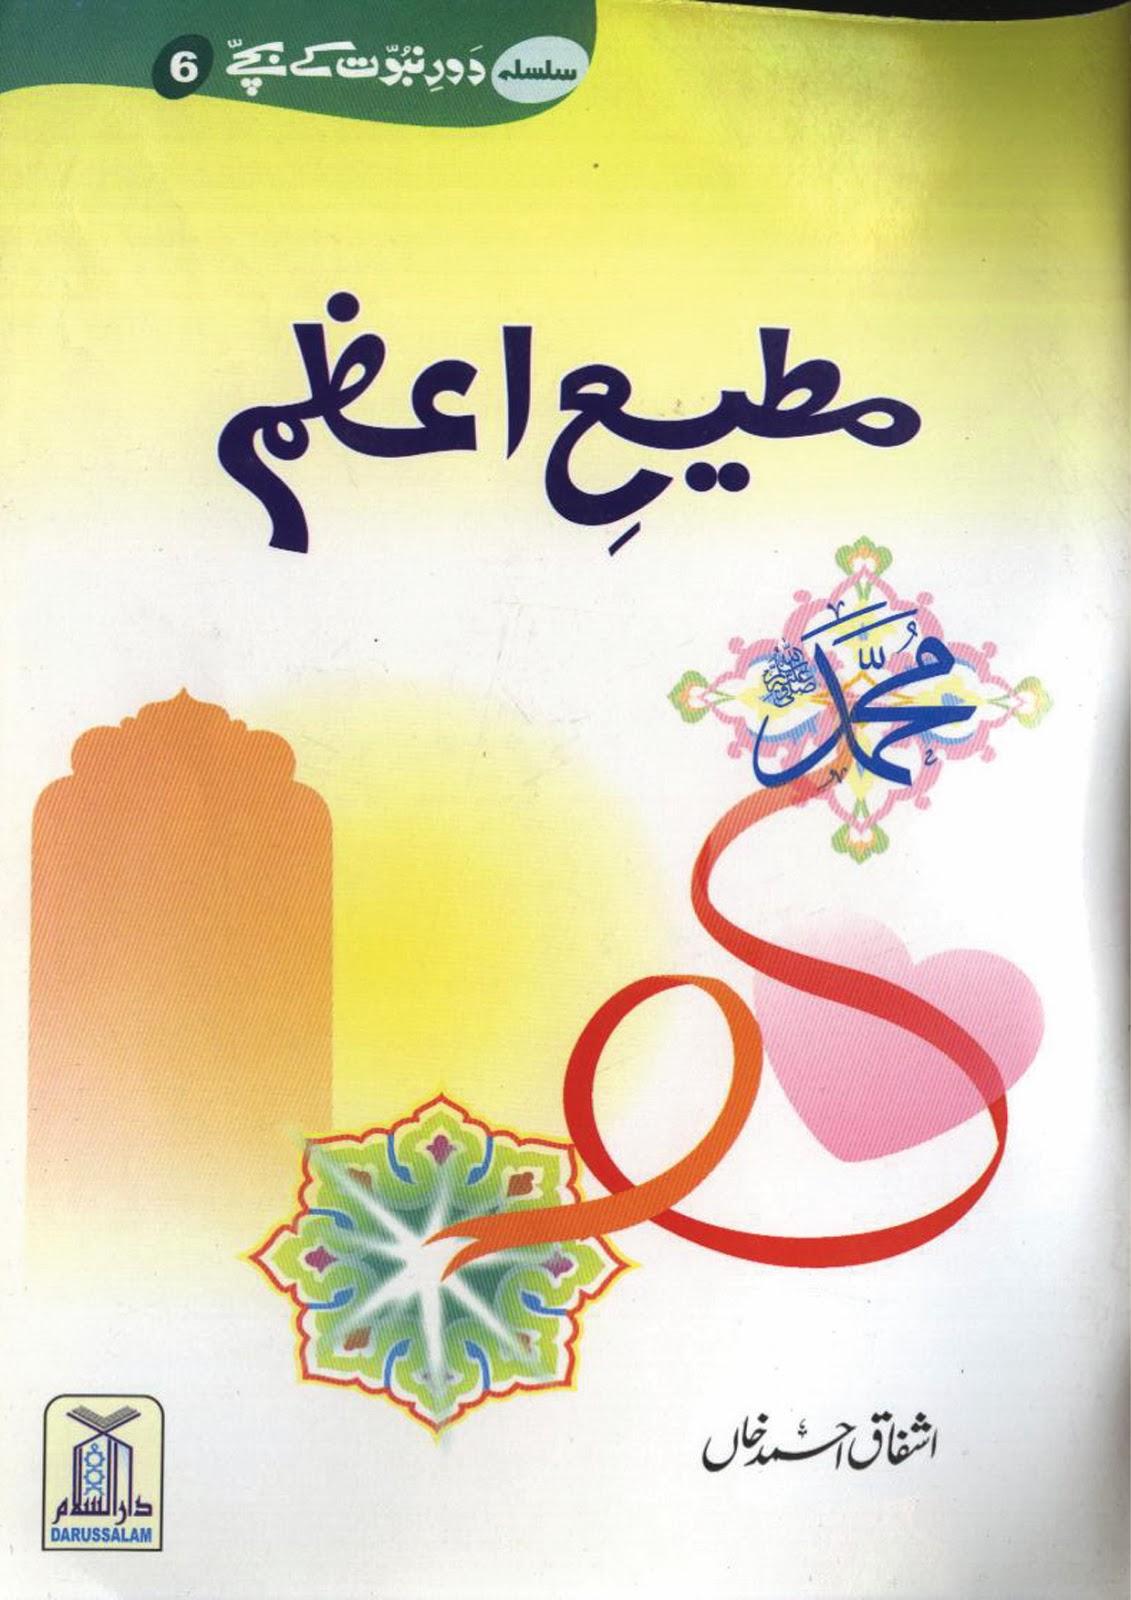 http://urduguru1.blogspot.com/2014/02/mati-e-azim-abdullah-bin-umar-ra.html